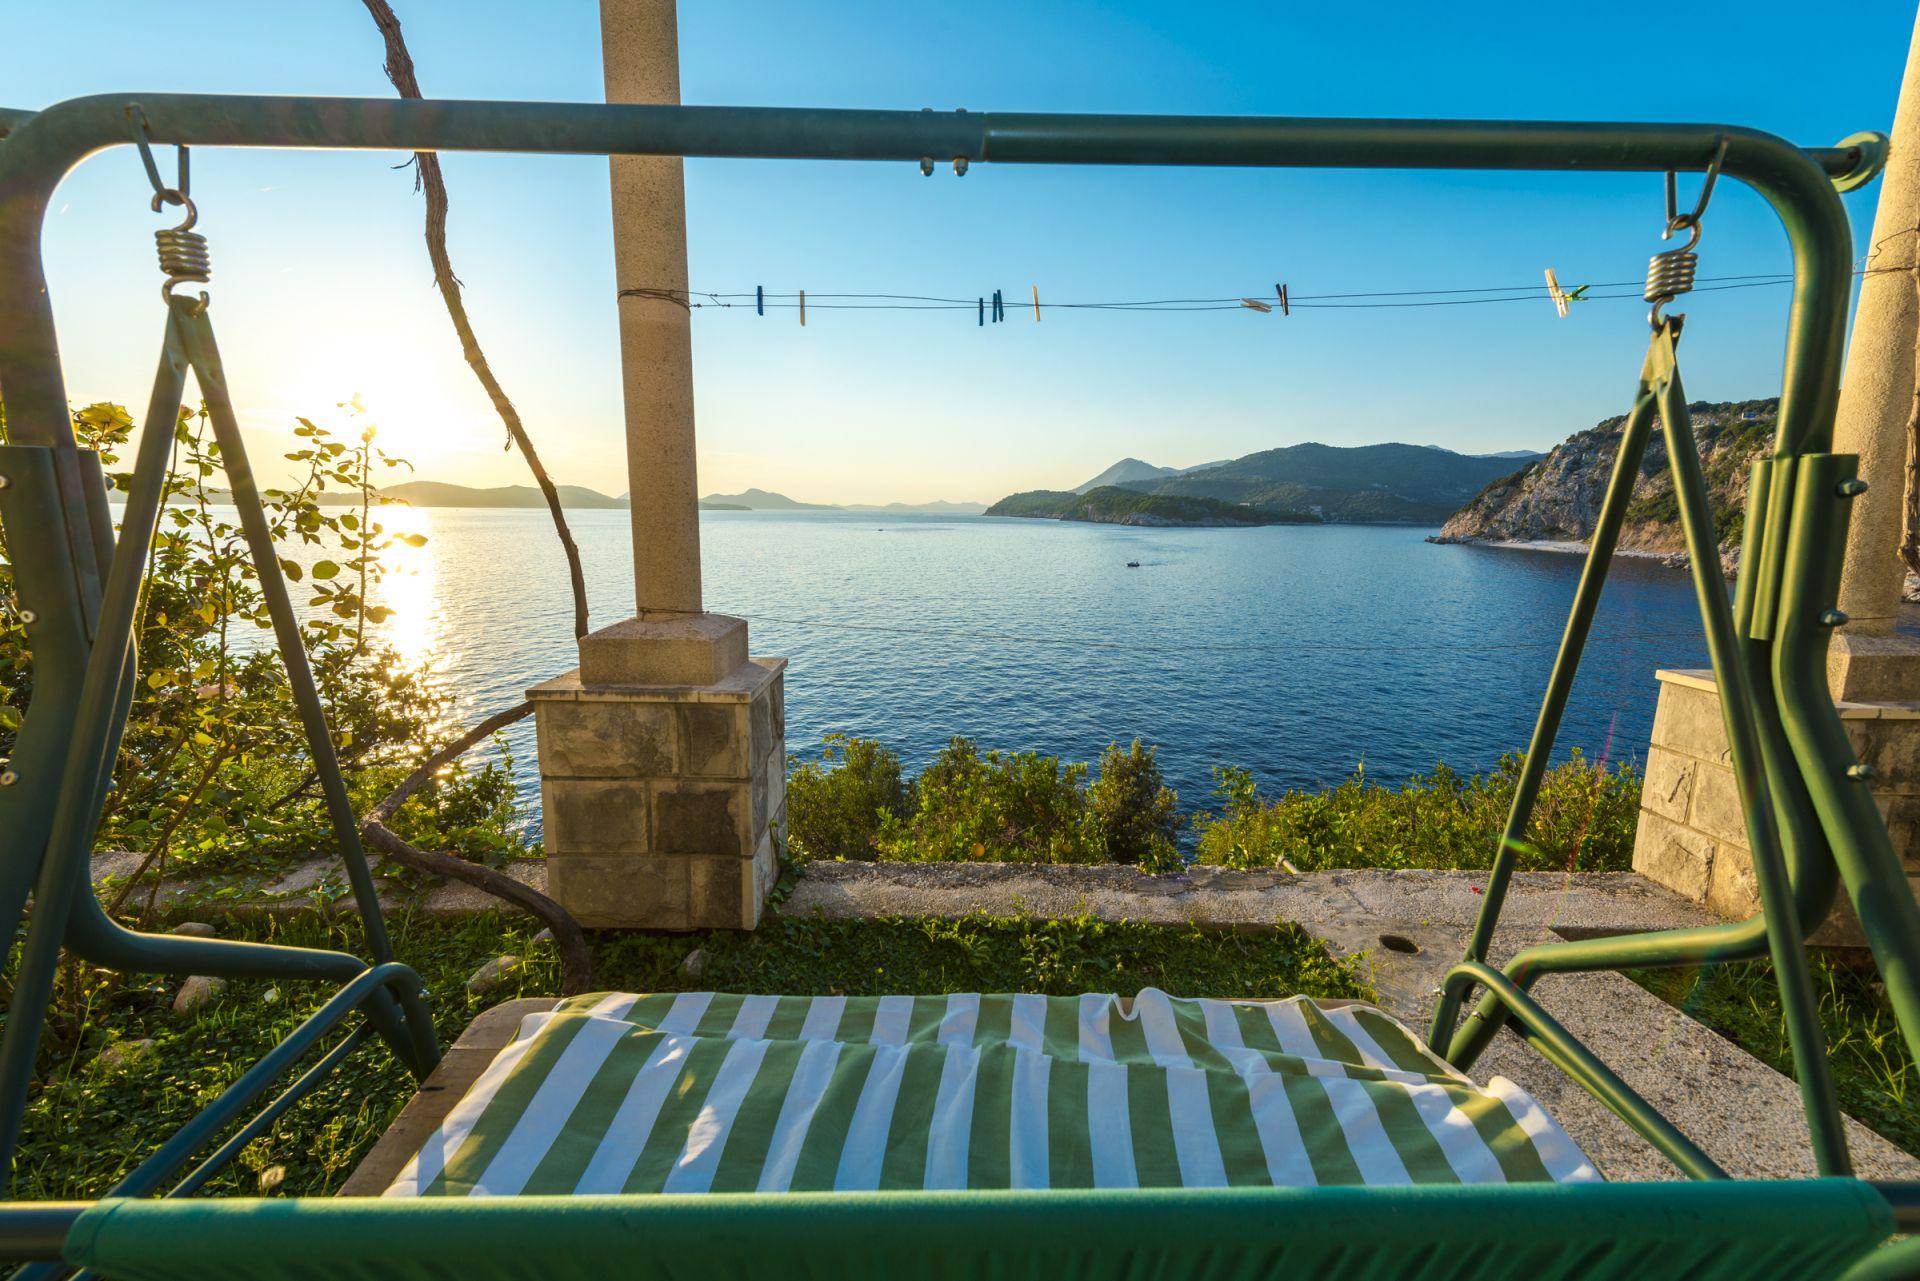 Apartamente Apartment Dia - 30 m from sea: A1 Zaton (Dubrovnik), Riviera Dubrovnik 52768, Stikovica, , Rajoni i Splitit/Dalmacisë